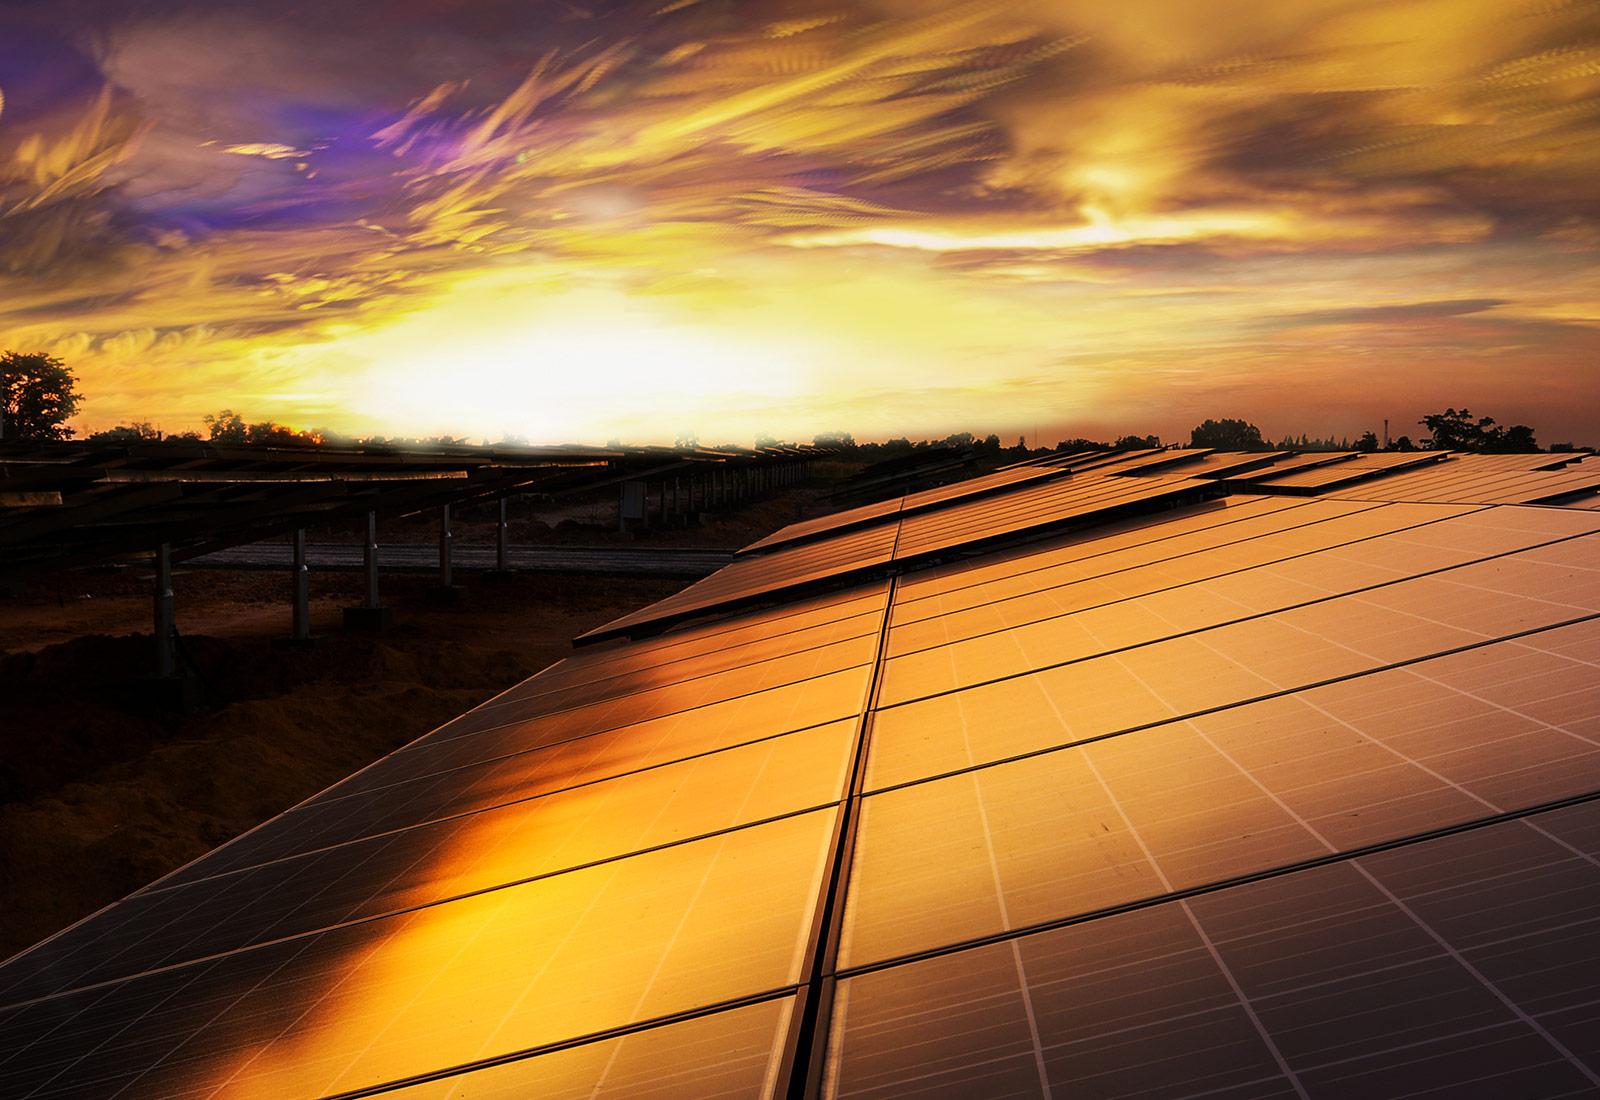 Sunrise Energy S A E Multilateral Investment Guarantee